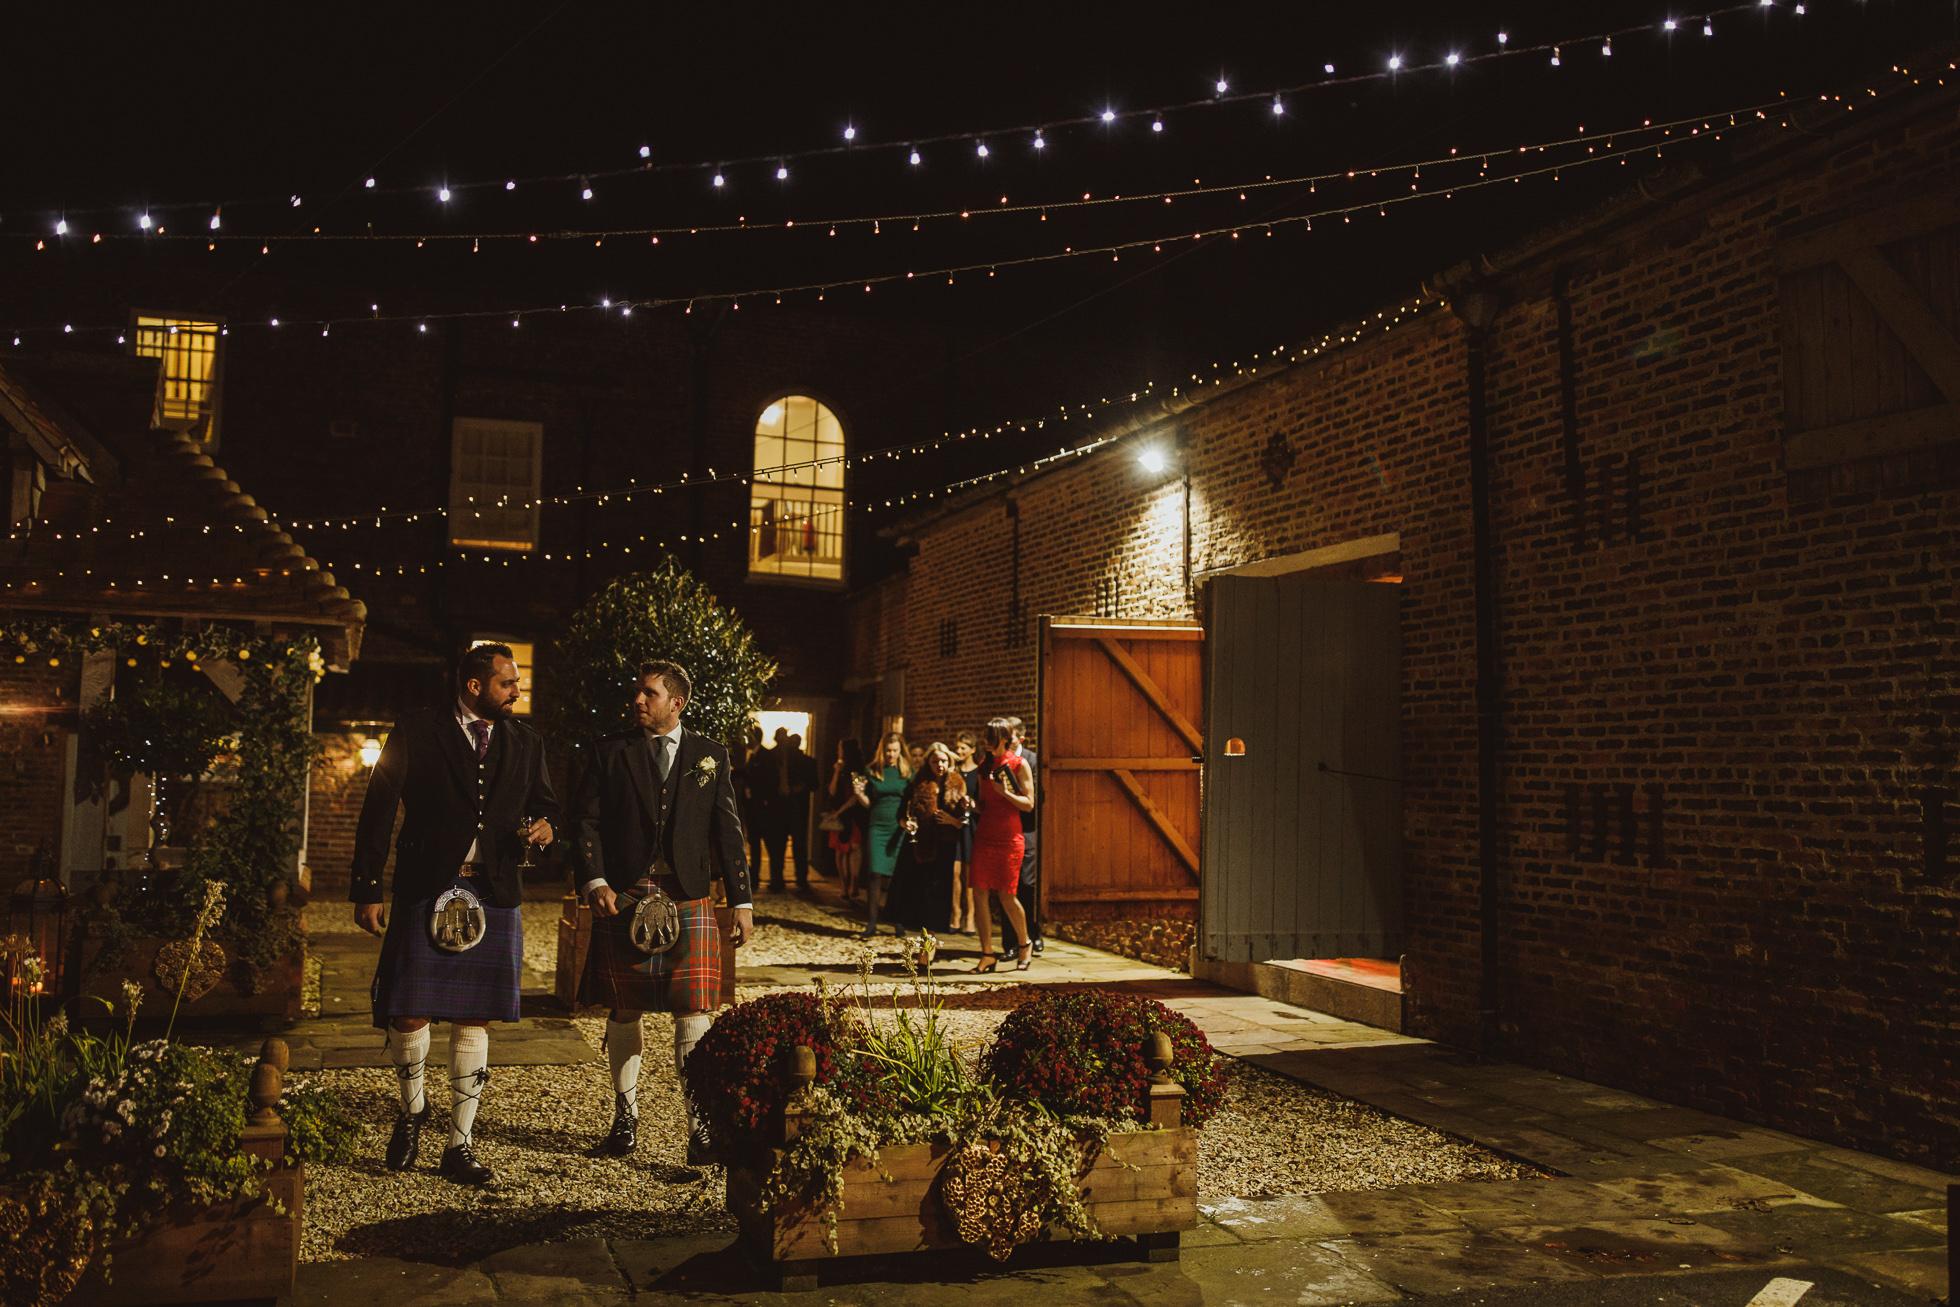 hornington_manor_wedding_photographer-93.jpg